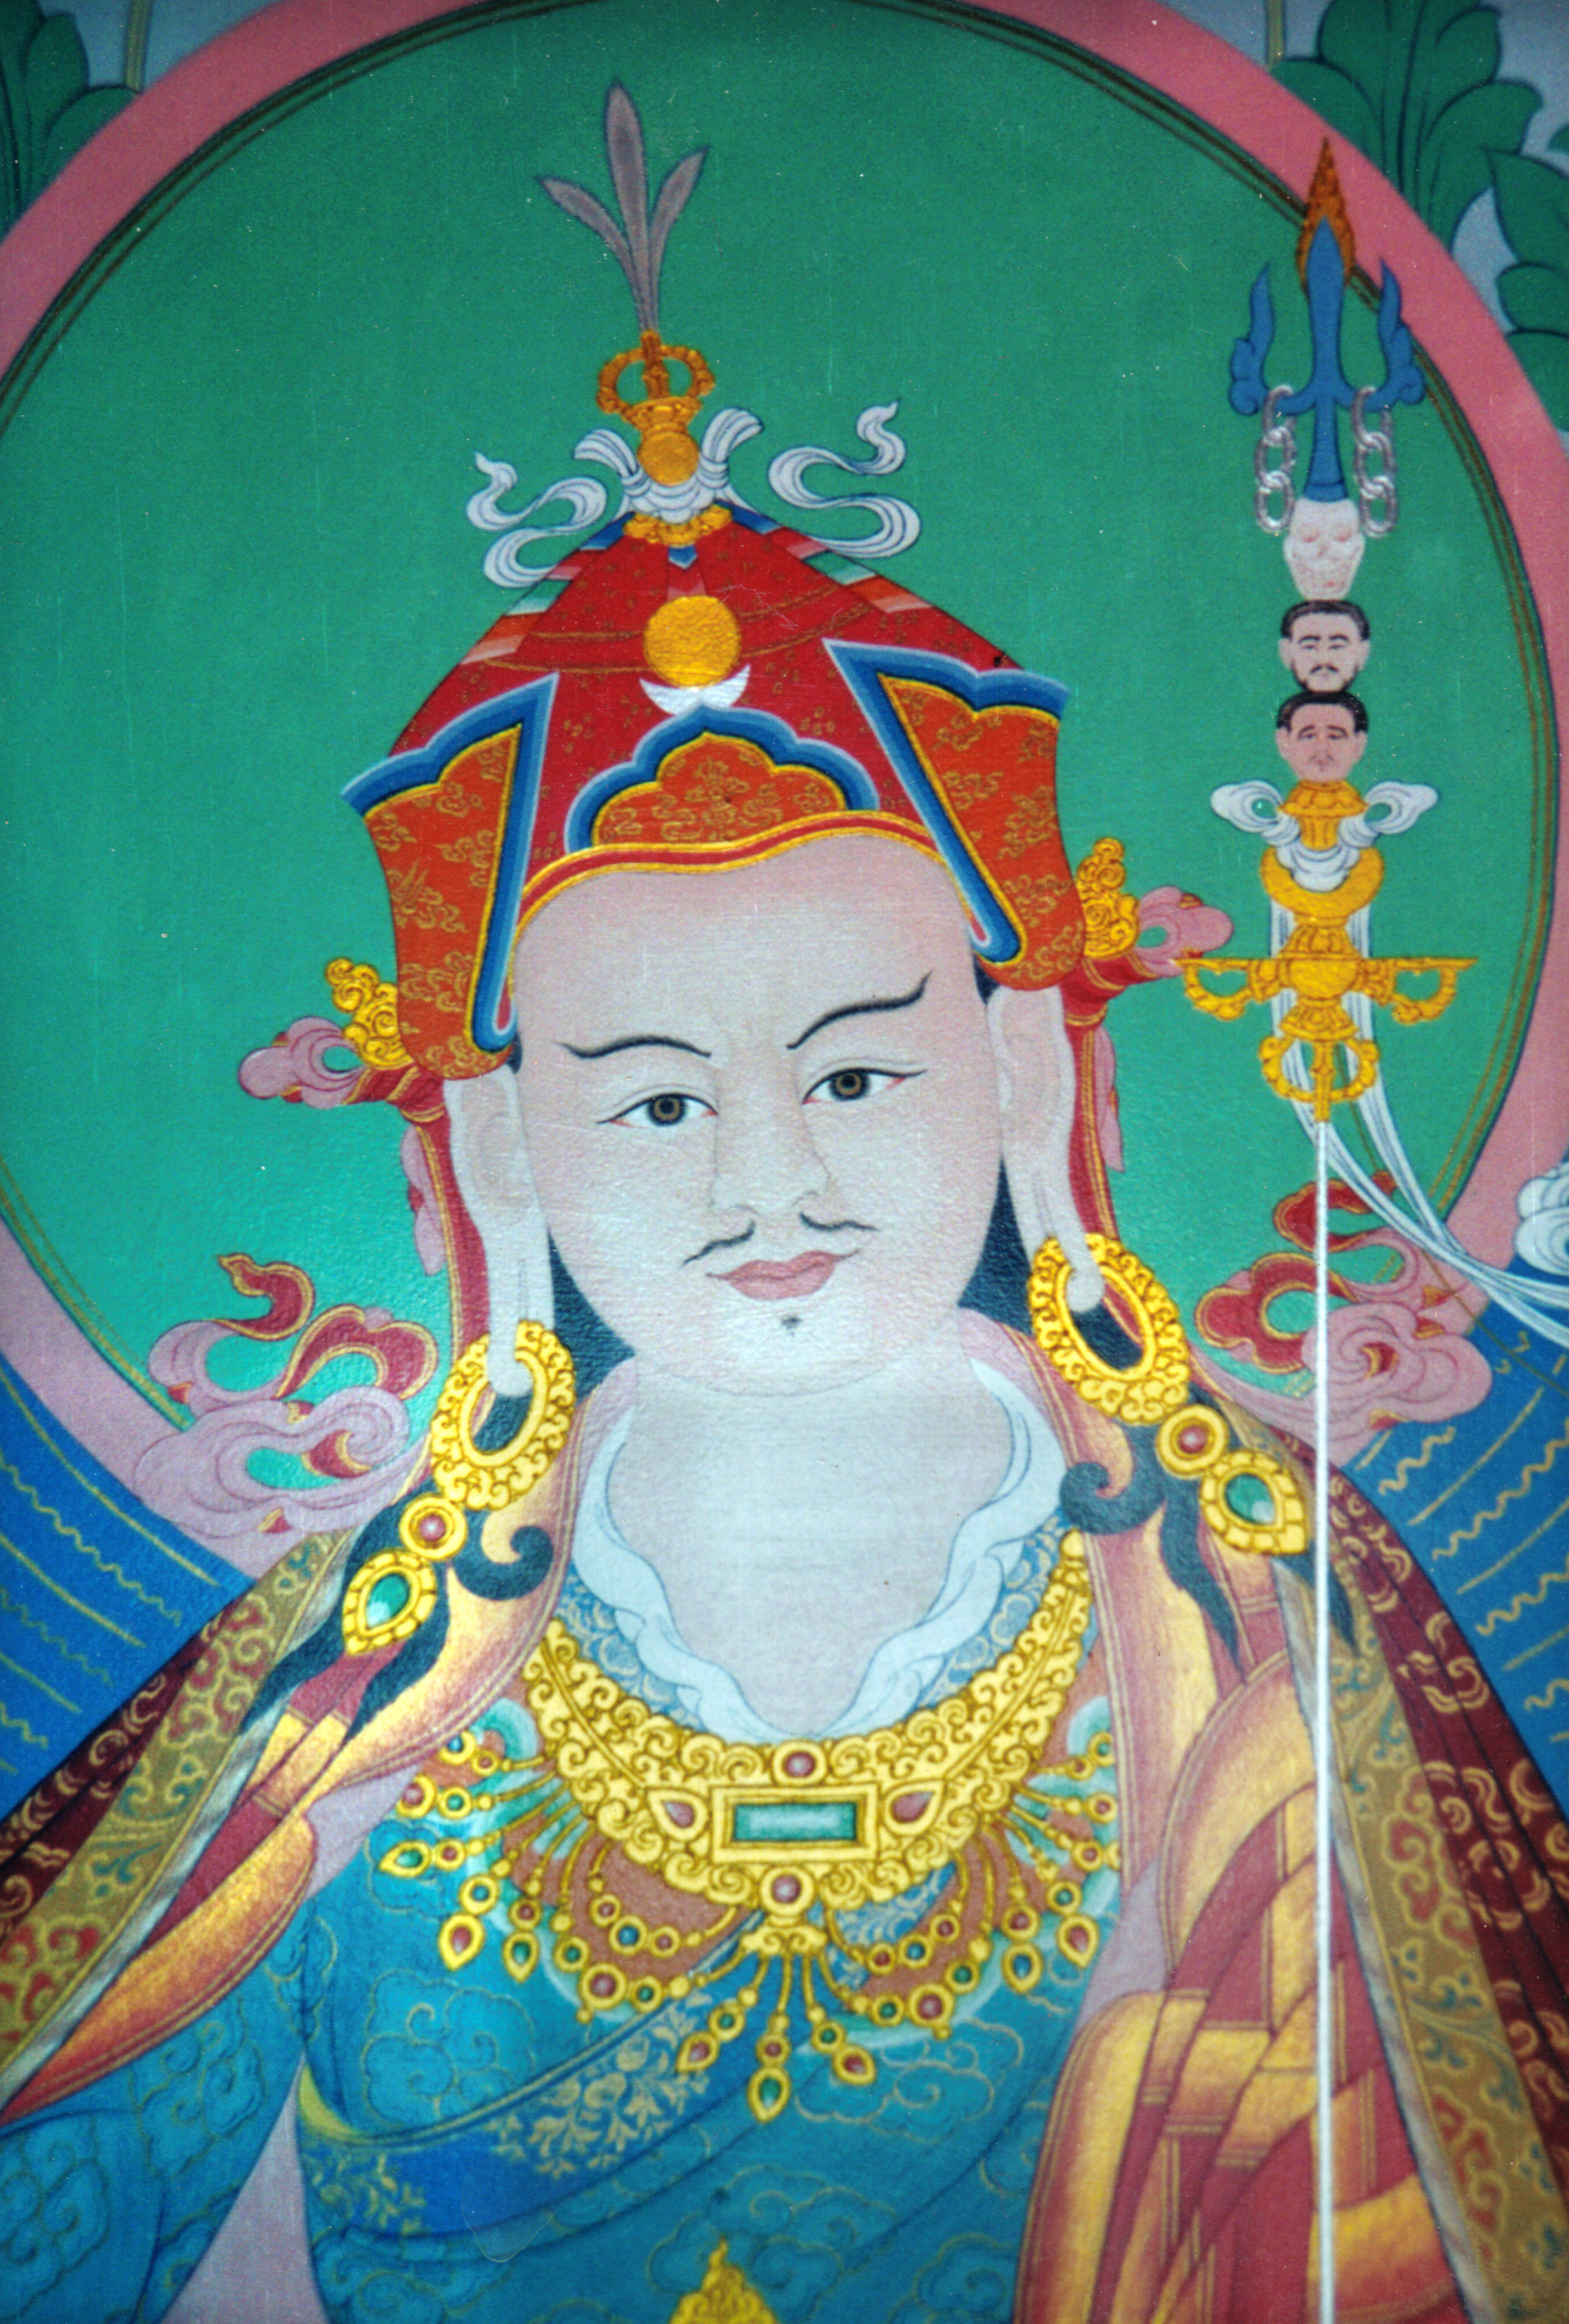 Guru Rinpoche by Lama Sonam Tashi Choling